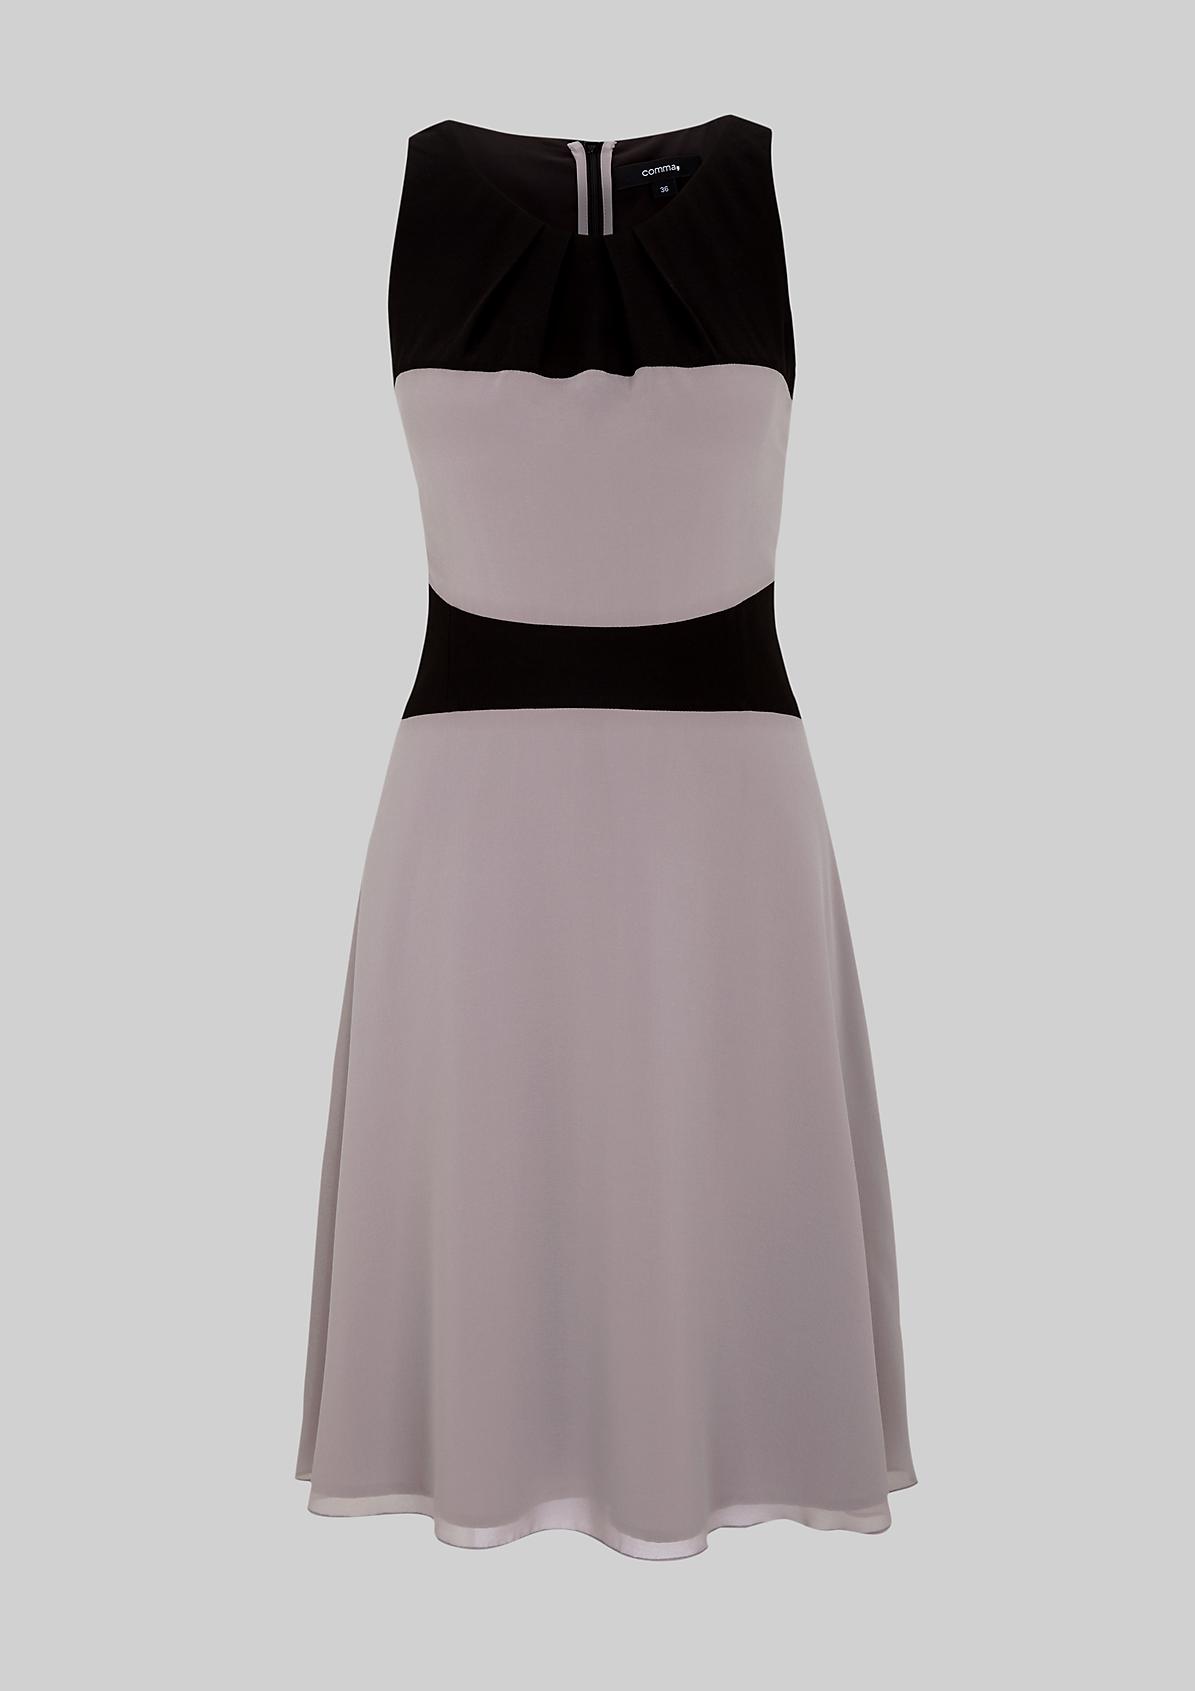 Aufregendes Abendkleid in Colourblock-Optik